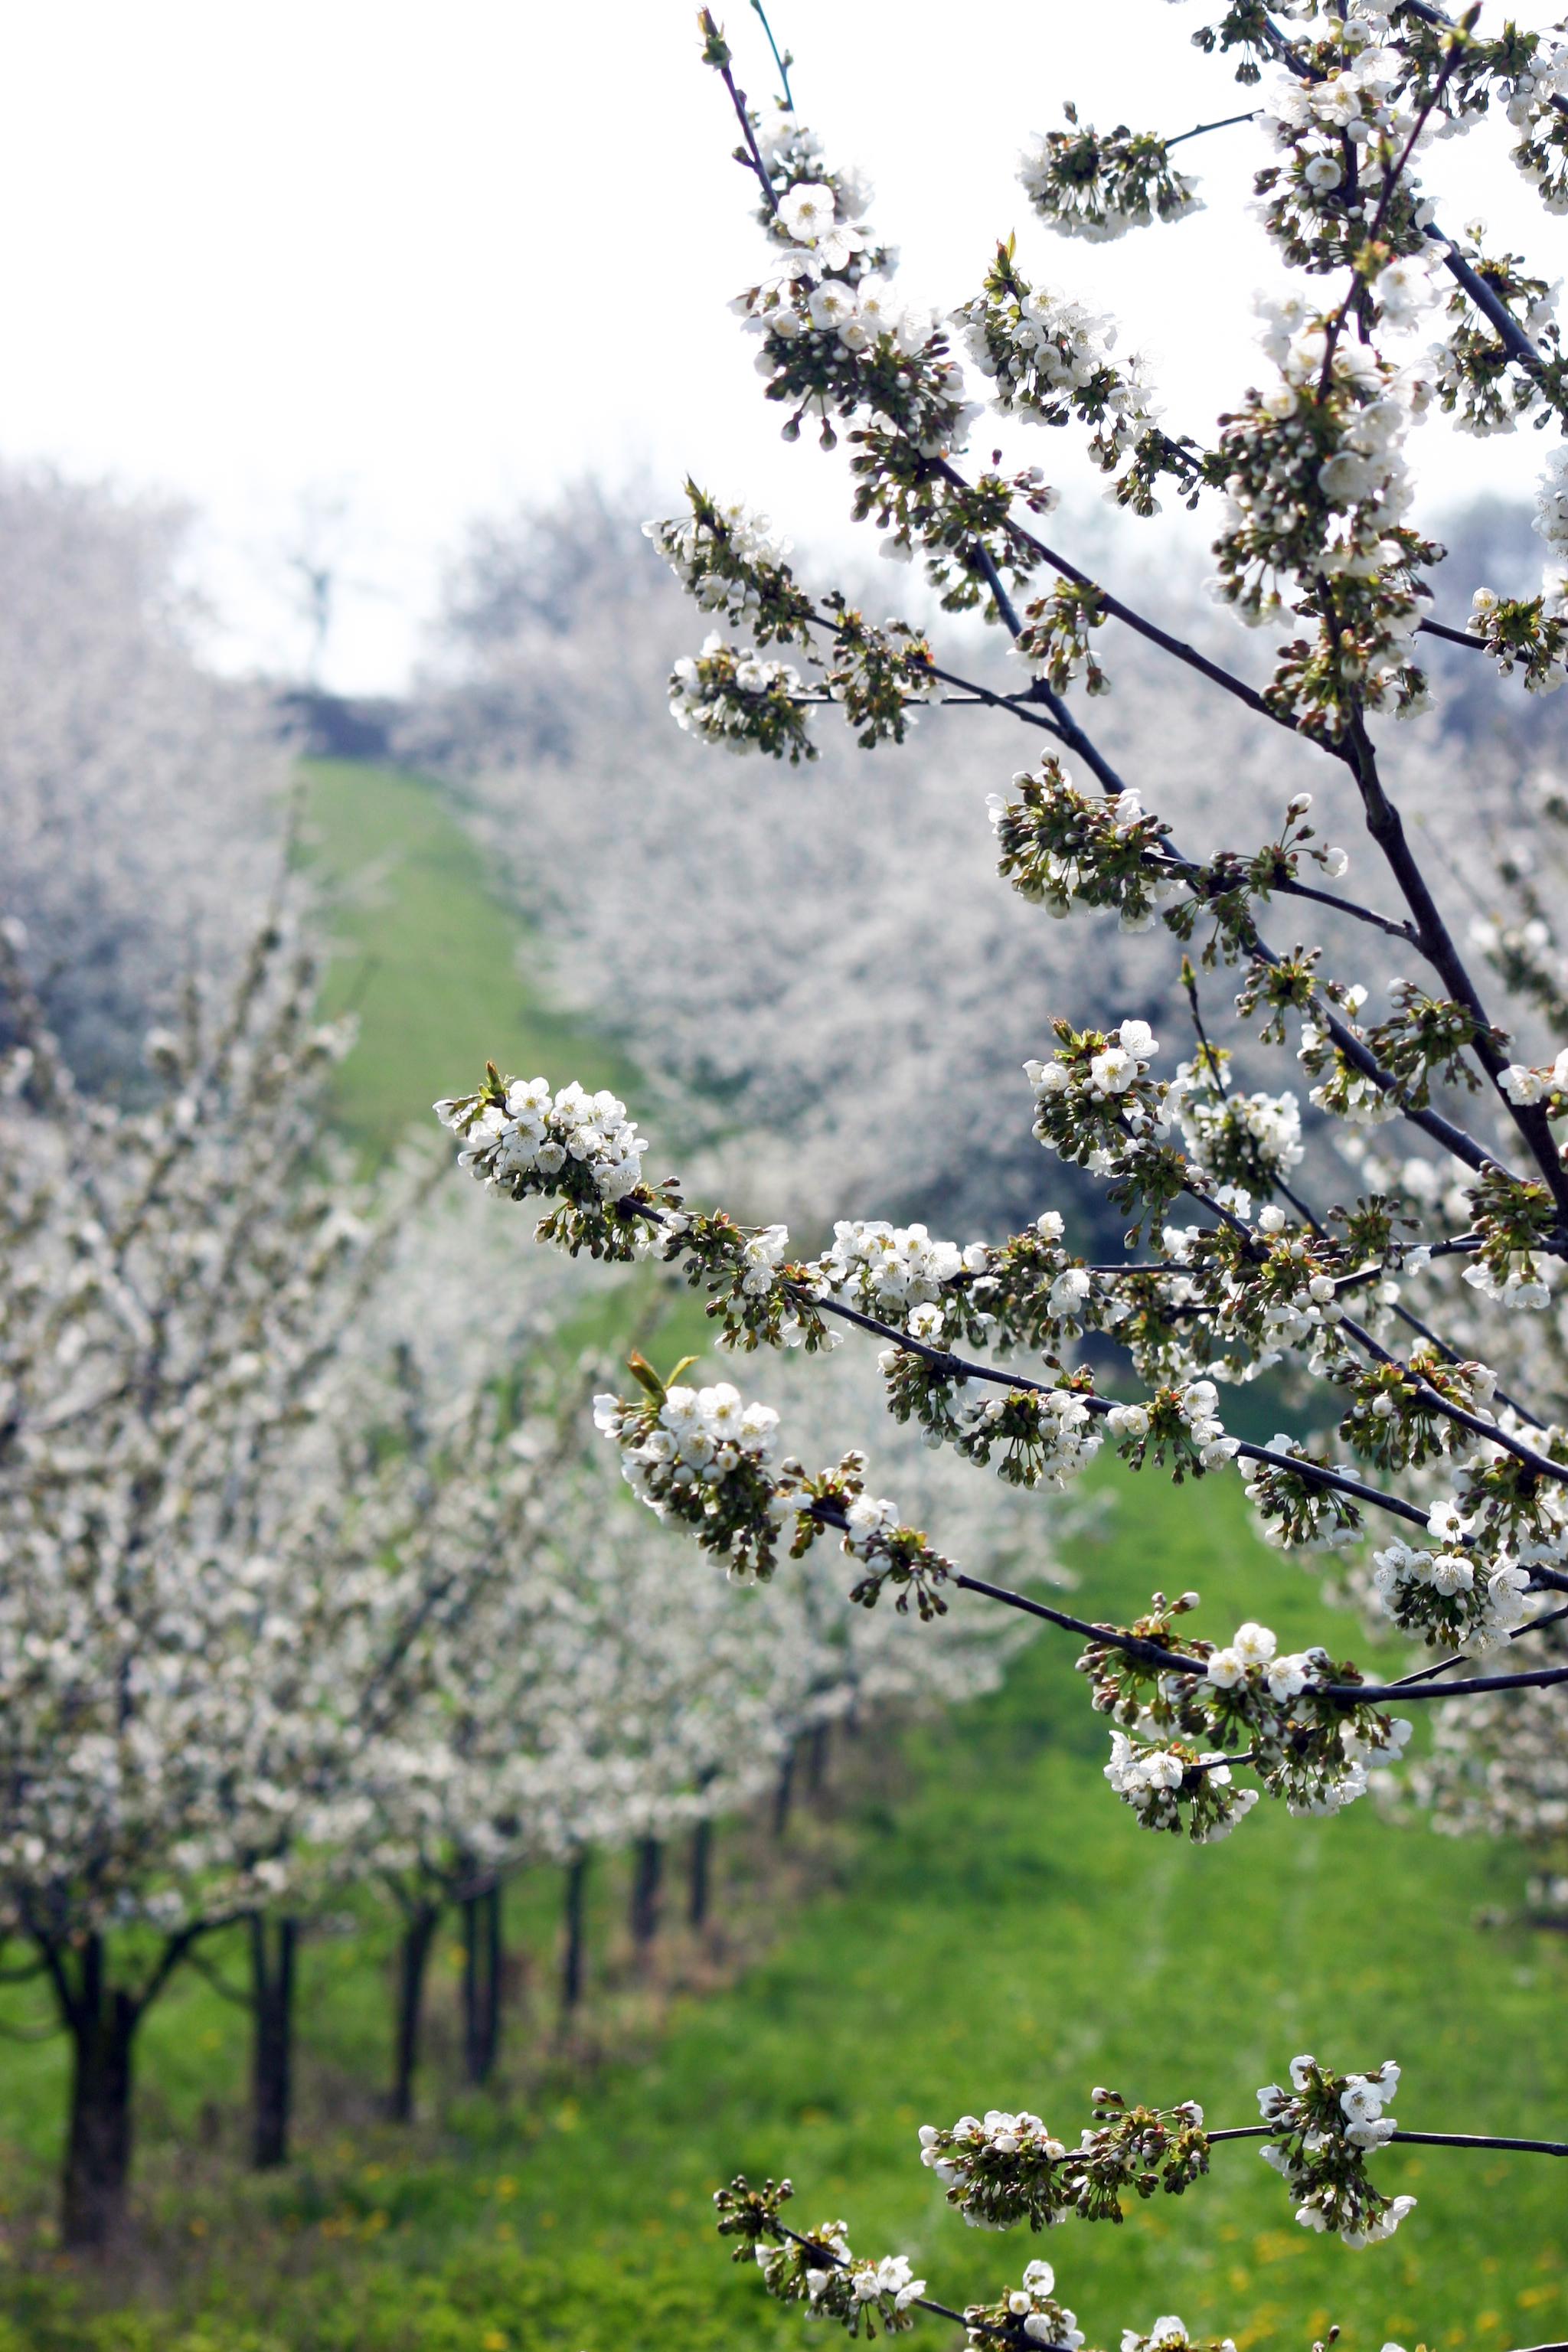 3687-blühende-obstbäume